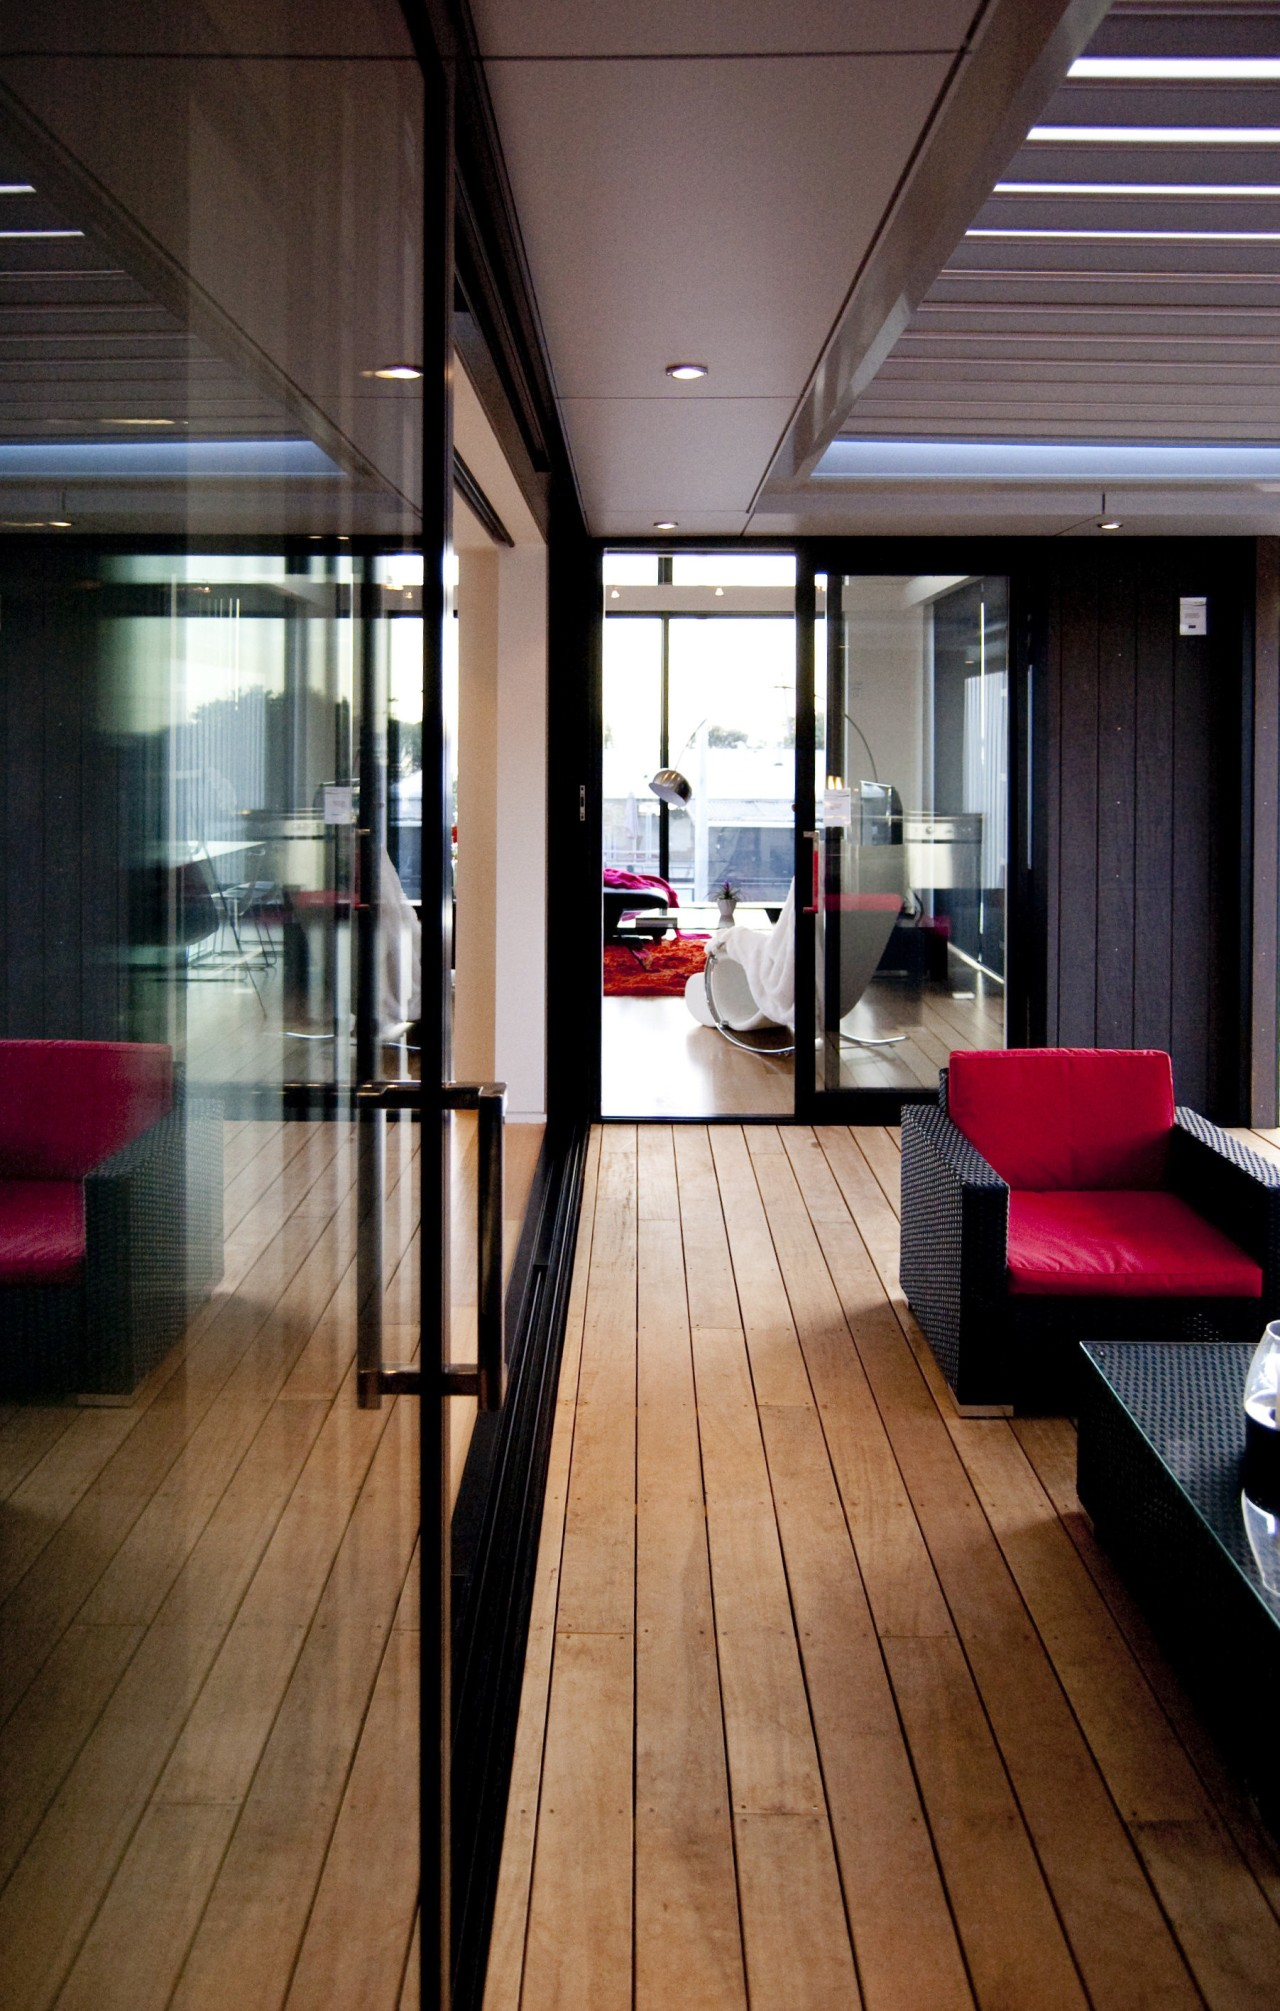 Interior view of this contemporary home apartment, architecture, floor, flooring, hardwood, house, interior design, window, wood, wood flooring, black